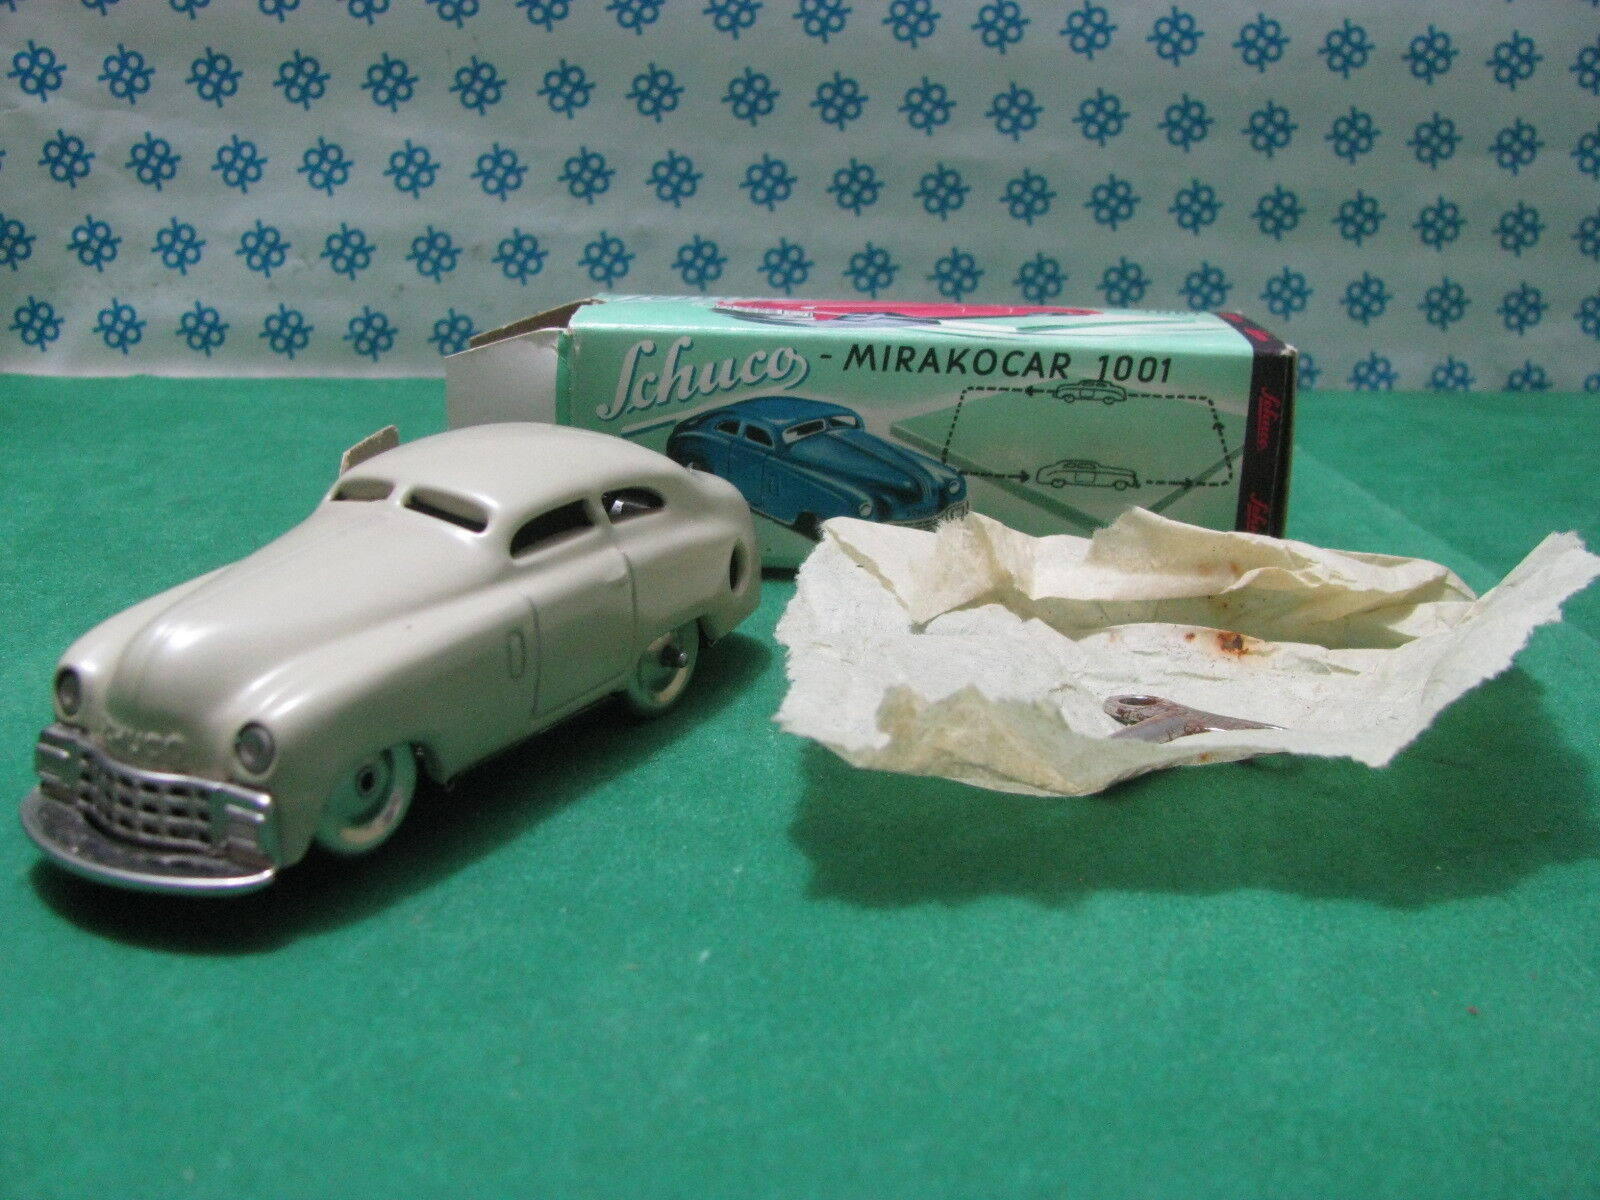 SCHUCO  Mirakocar  1001  - Western Germany anni 50    -  Mint